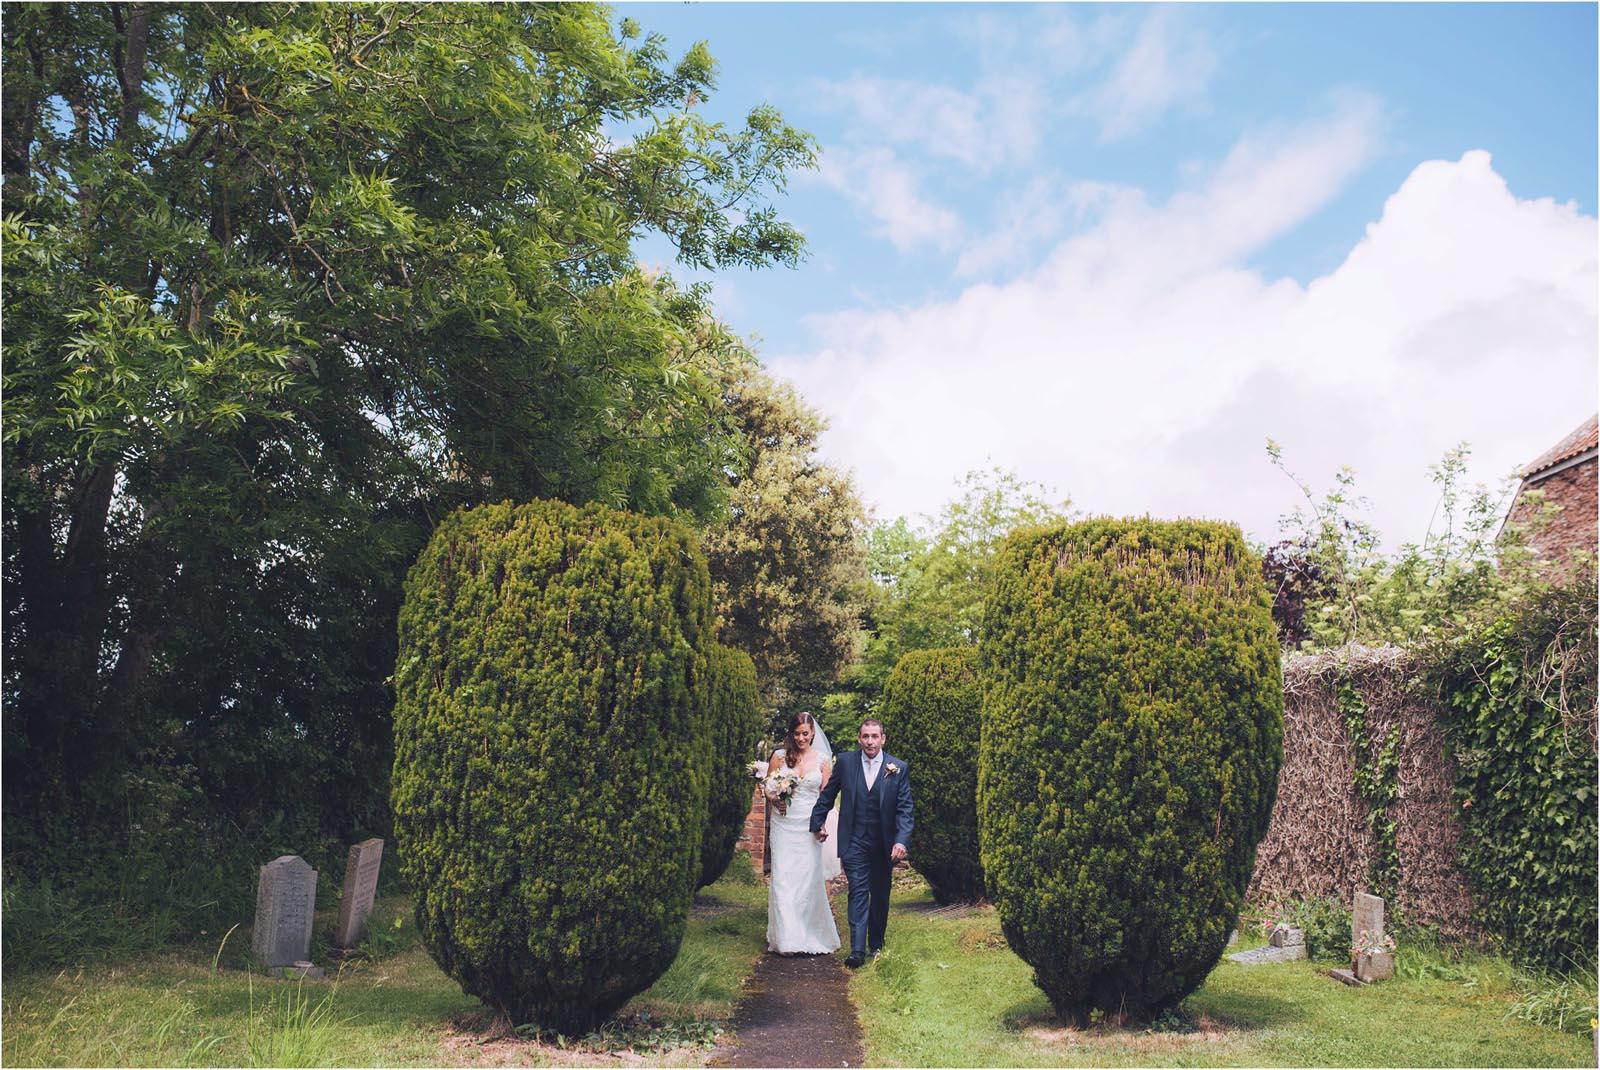 Simon biffen wedding photography 0057